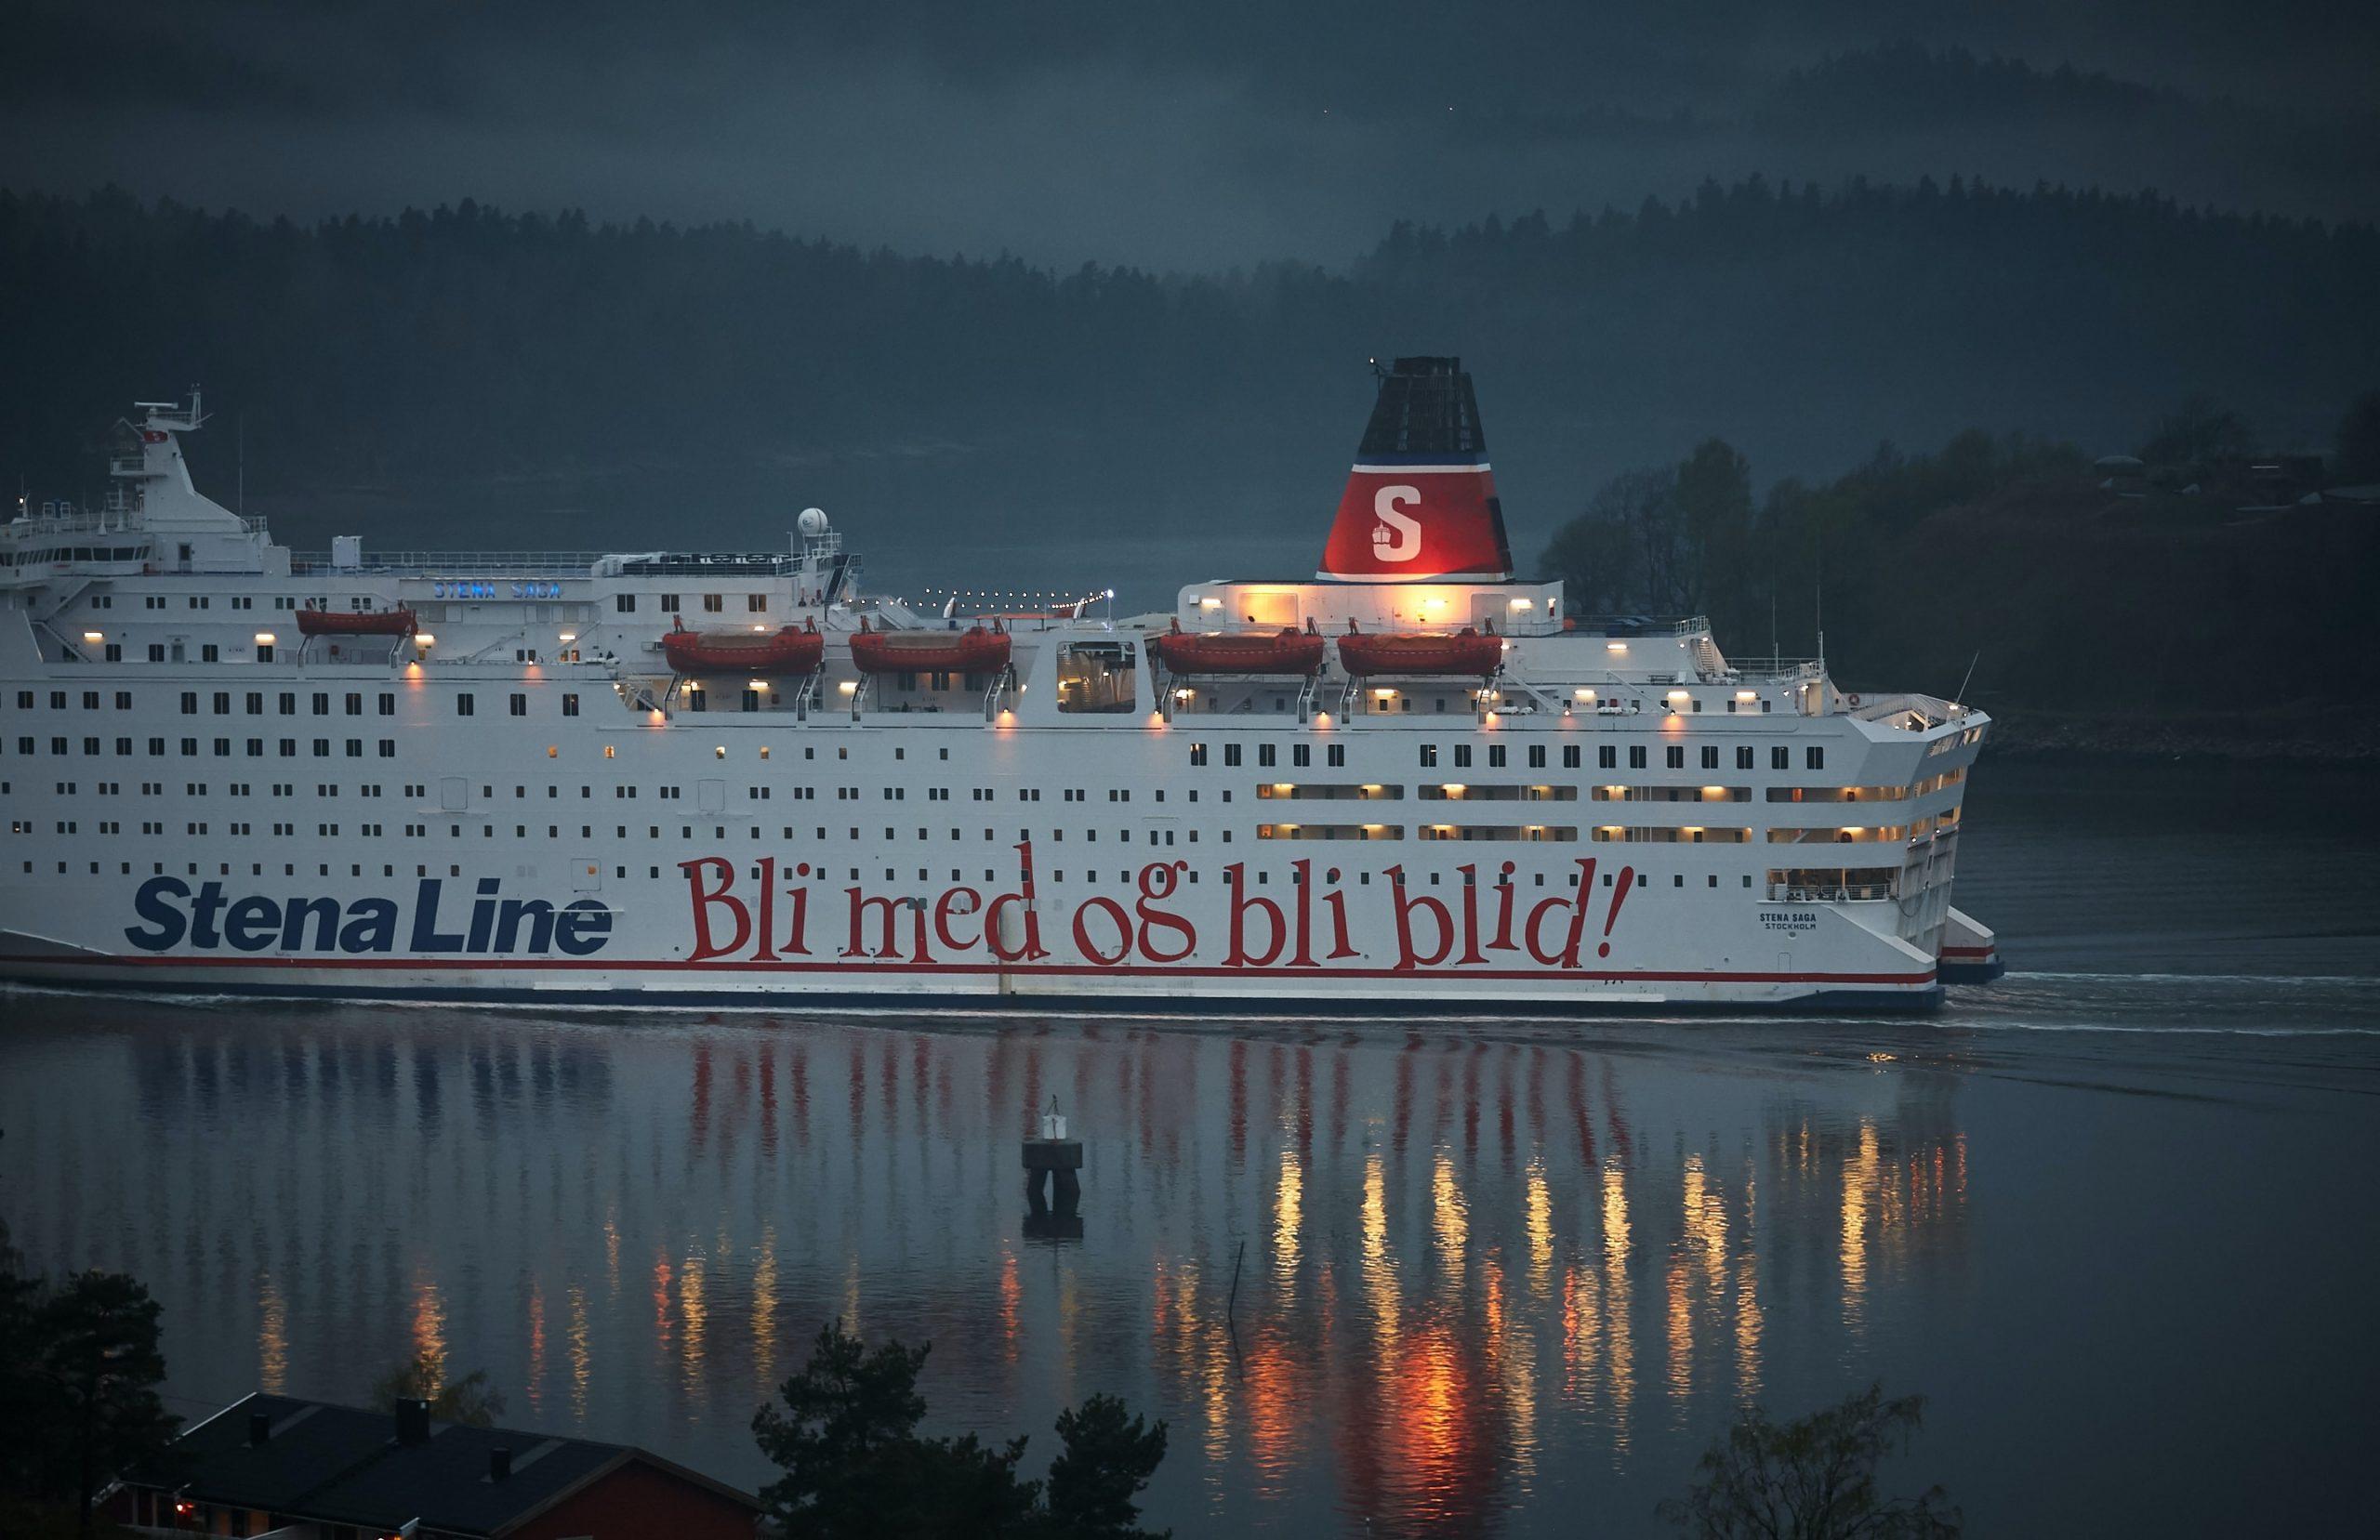 stenaline ferry on a passage